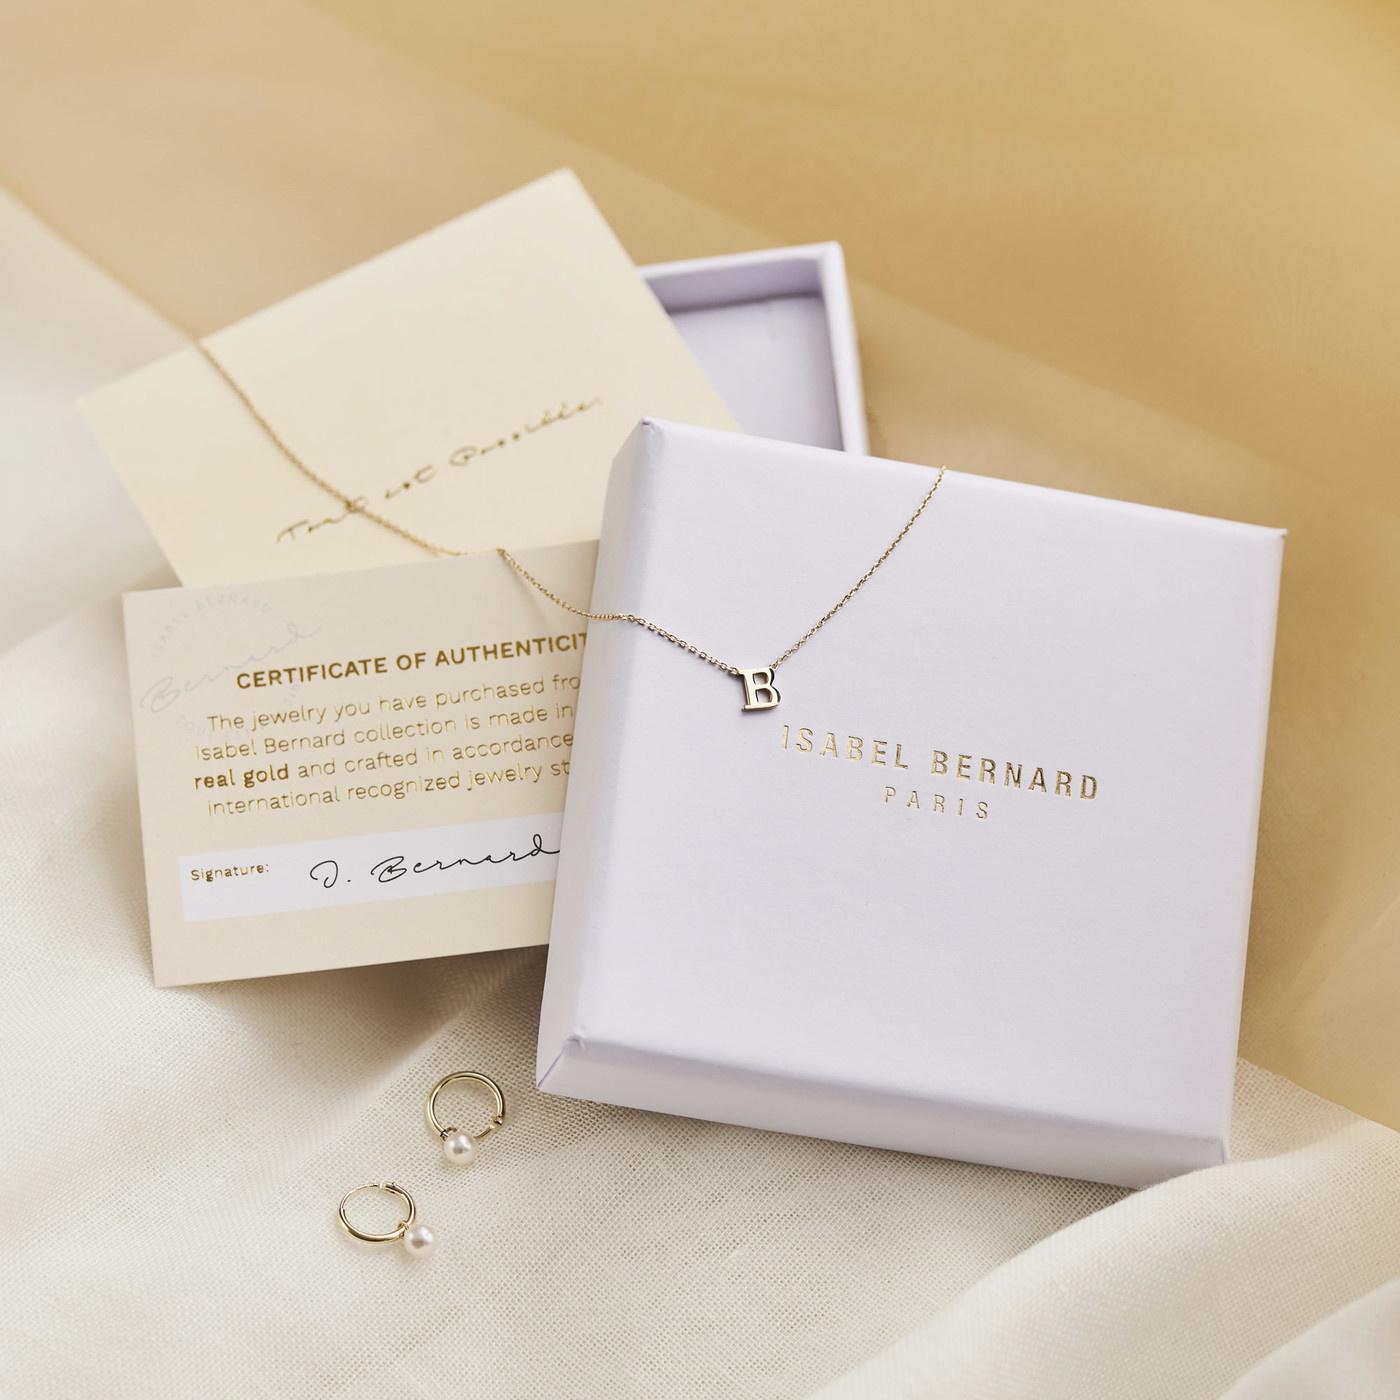 Isabel Bernard La Concorde Alizée collier en or rose 14 carats avec le coeur